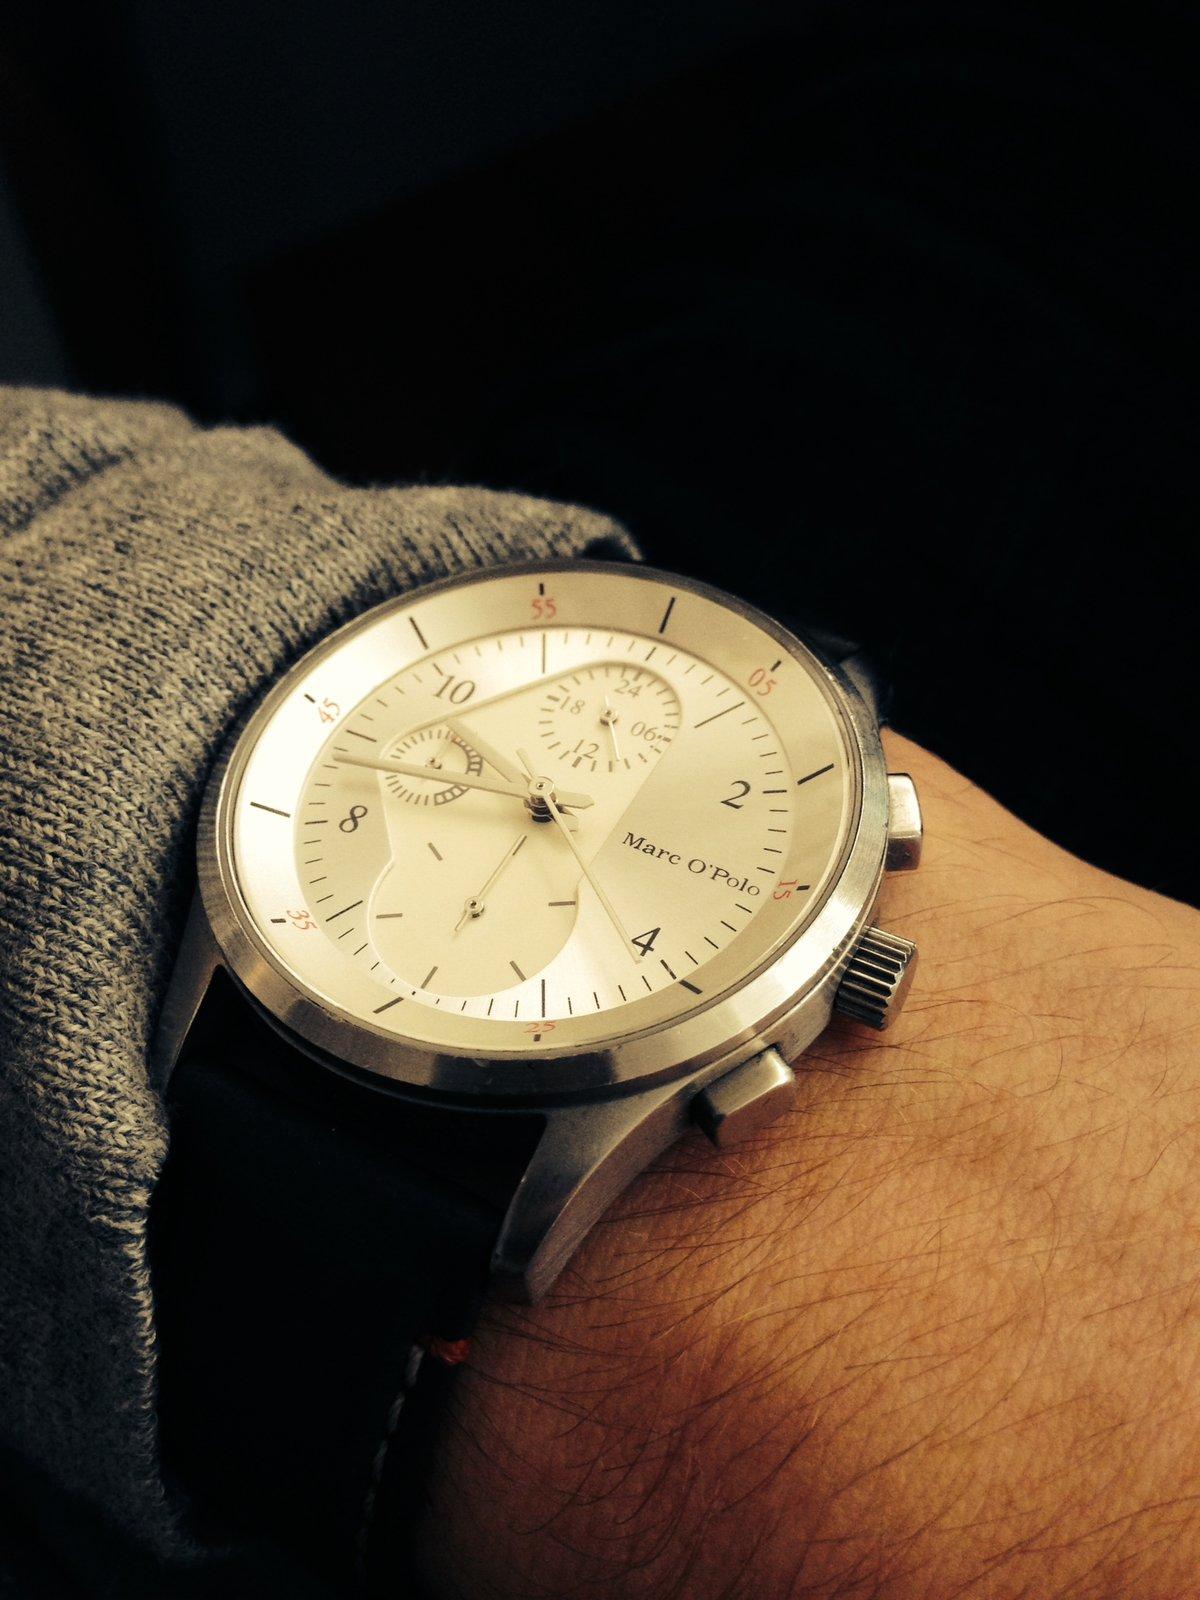 Armbanduhr am arm  Uhrenvorstellung: Marco Polo & Fossil - UhrForum